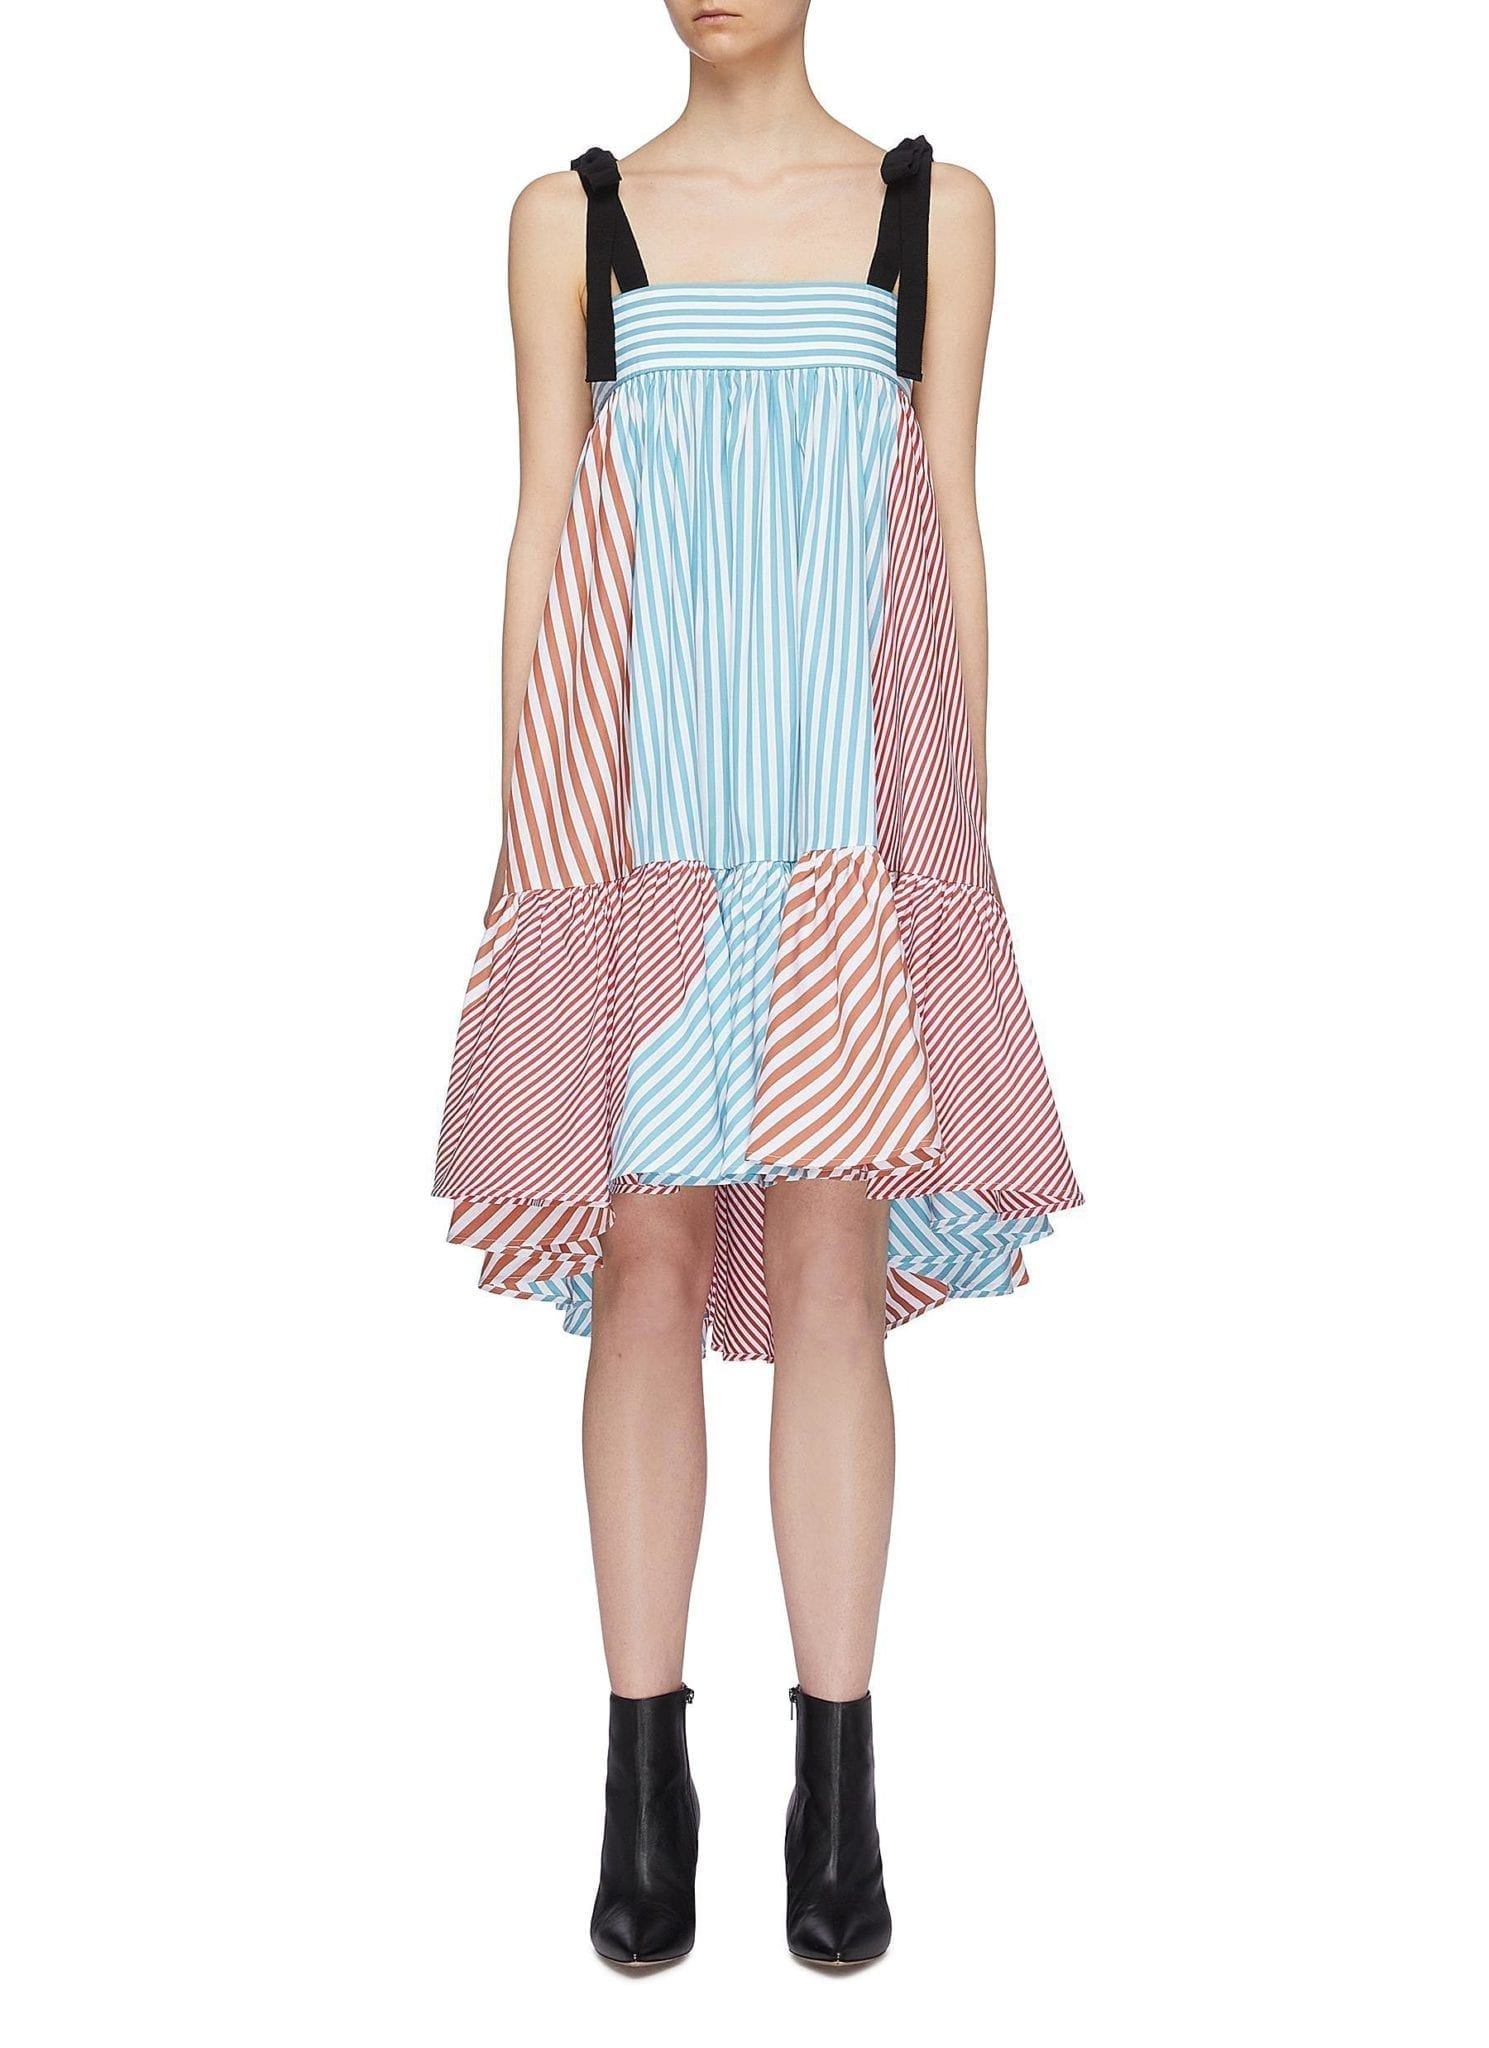 SILVIA TCHERASSI 'Calantha' Tie Shoulder Colourblock Stripe Peplum Dress